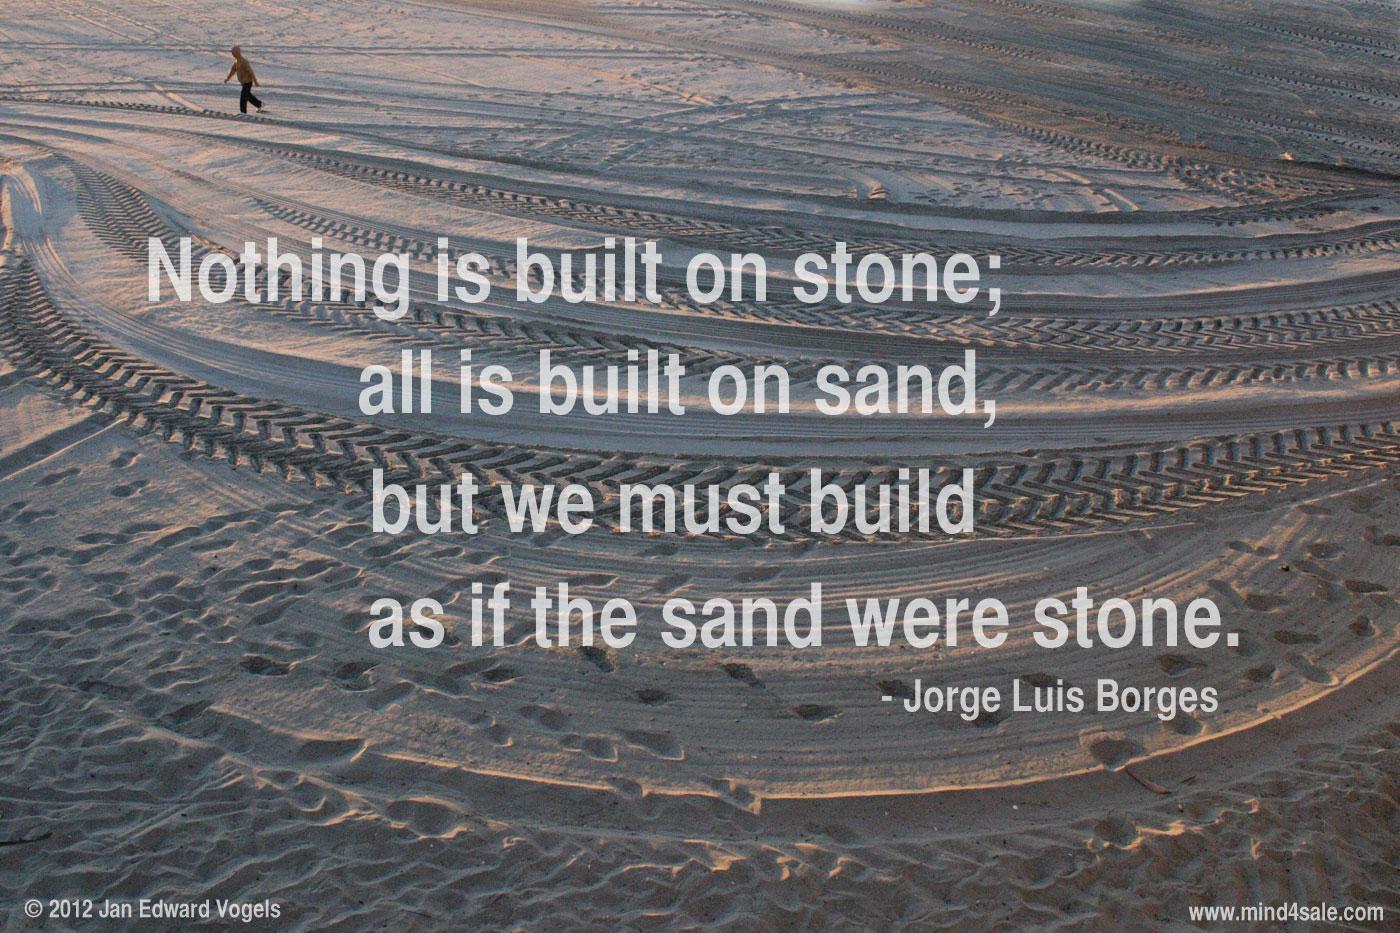 Jorge Luis Borges, quote, Canon EOS